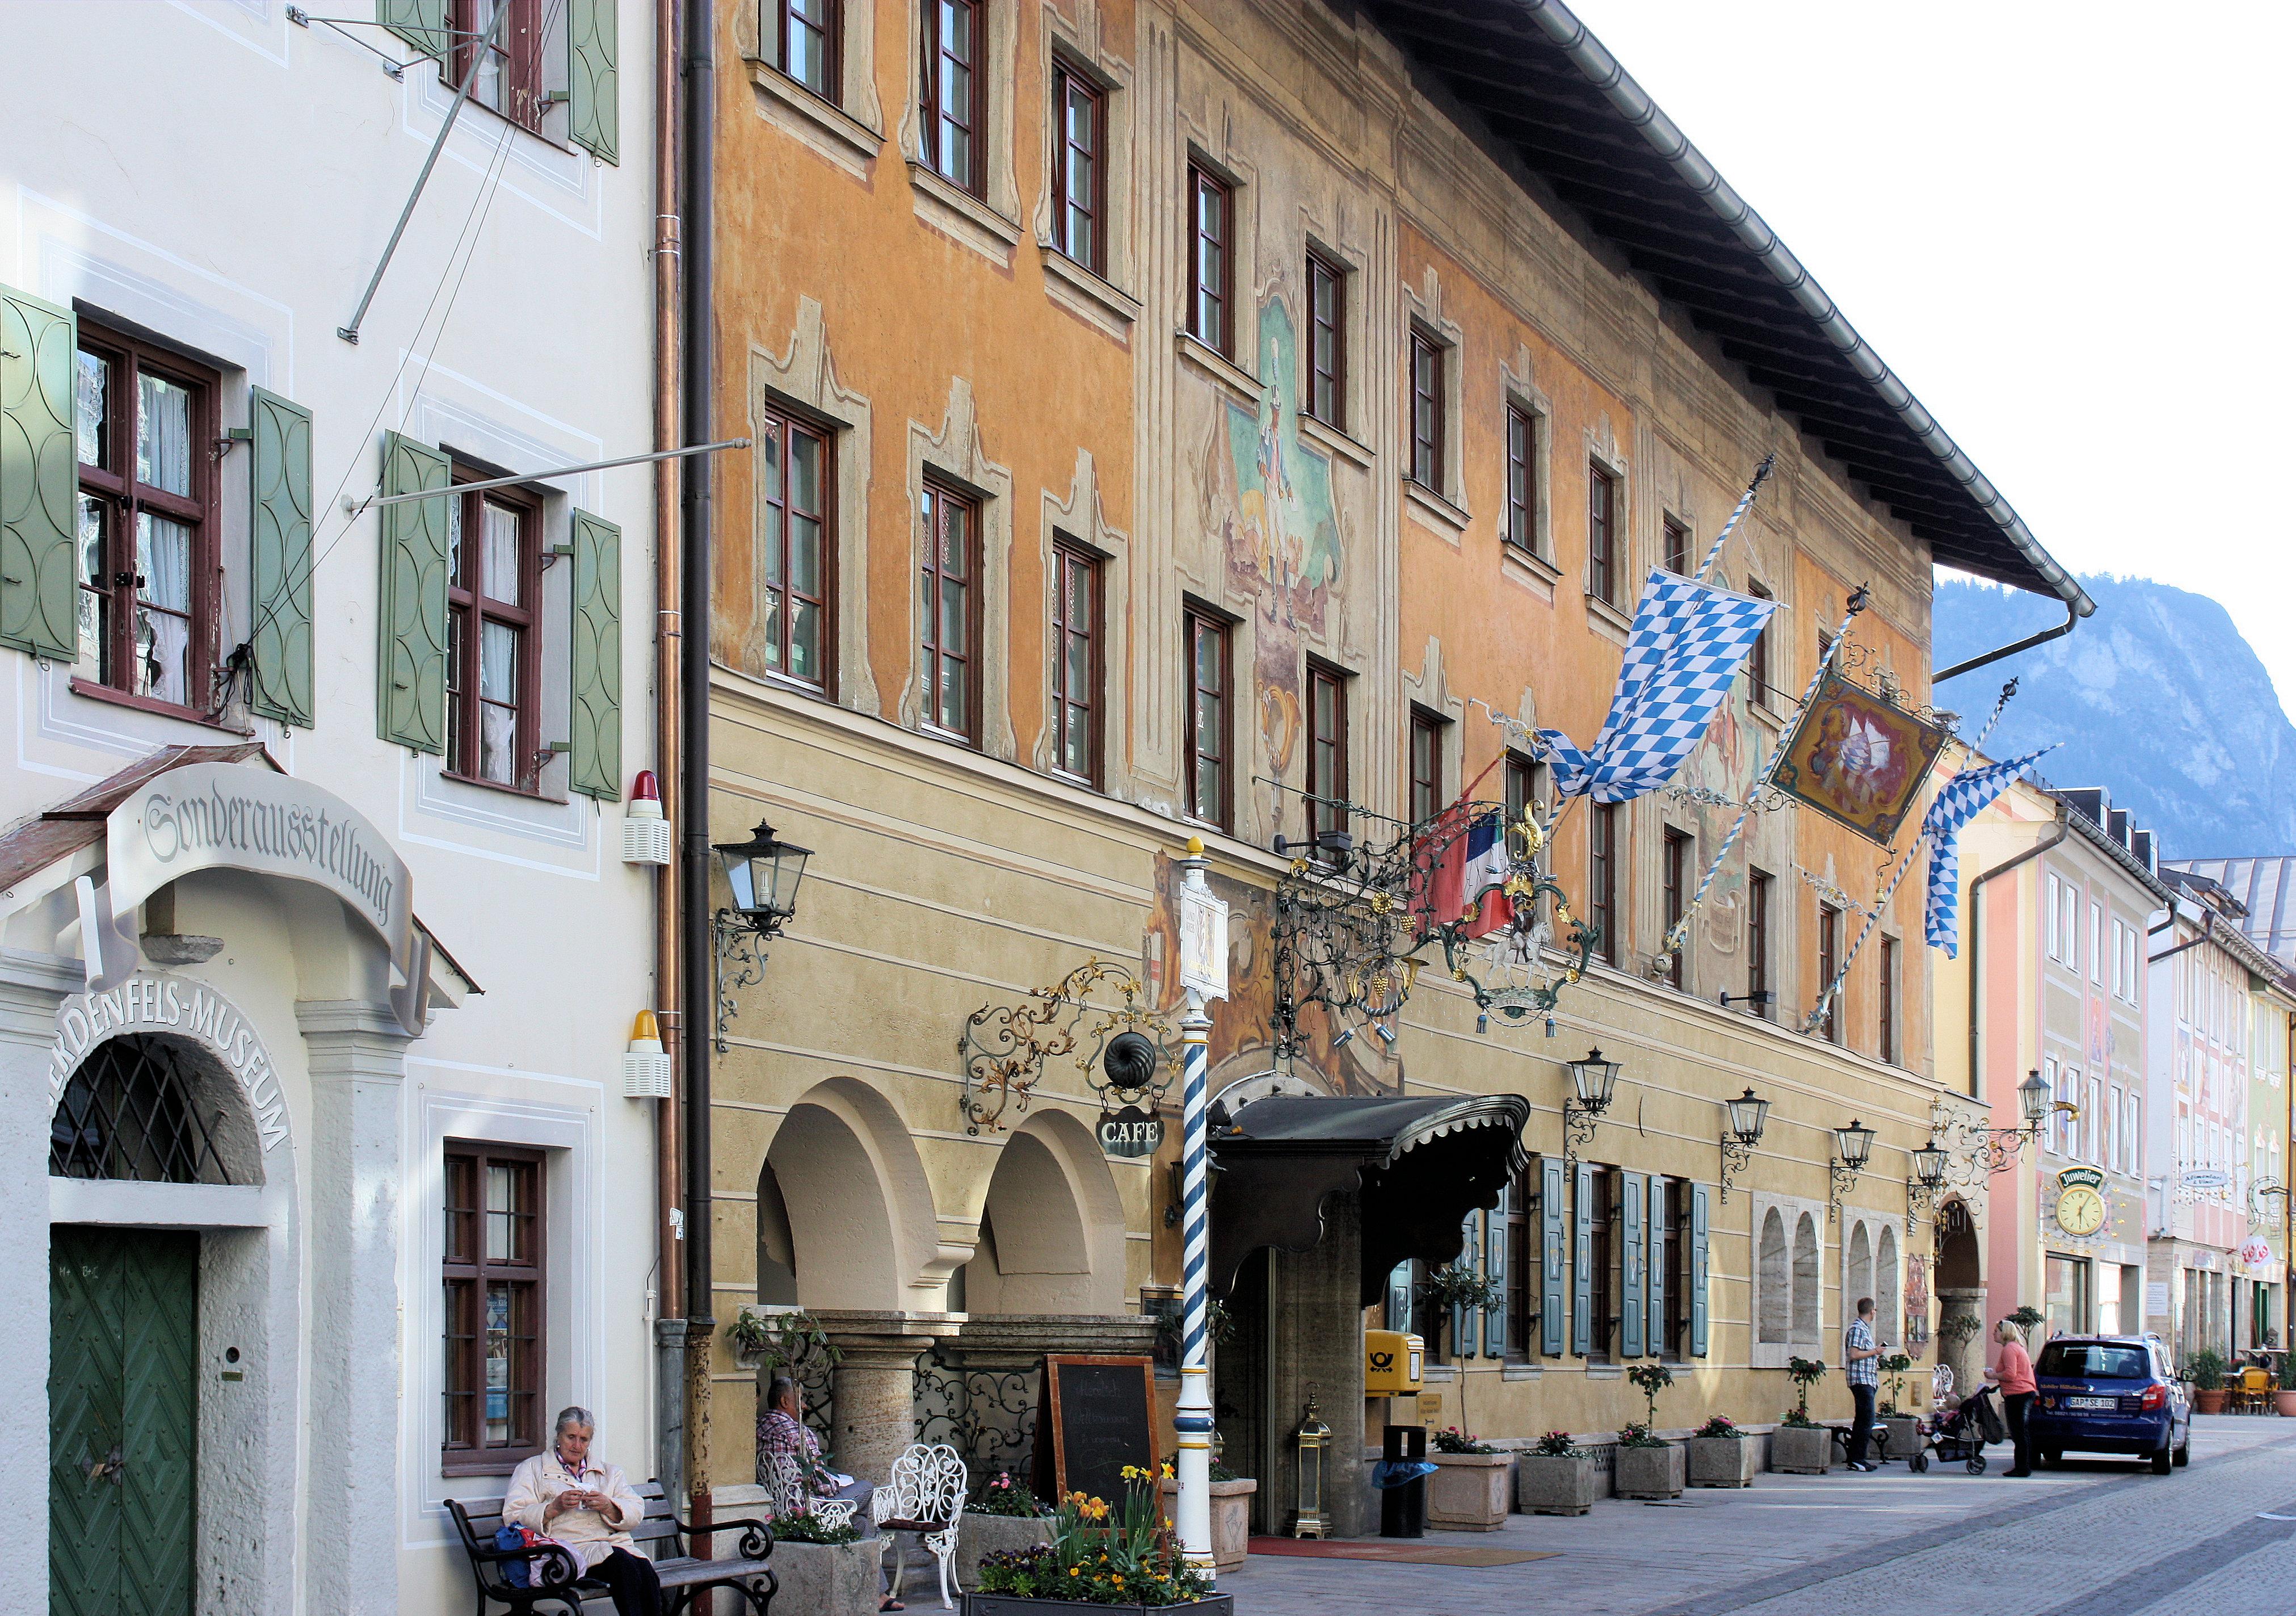 Grand Atlas Hotel Garmisch Partenkirchen